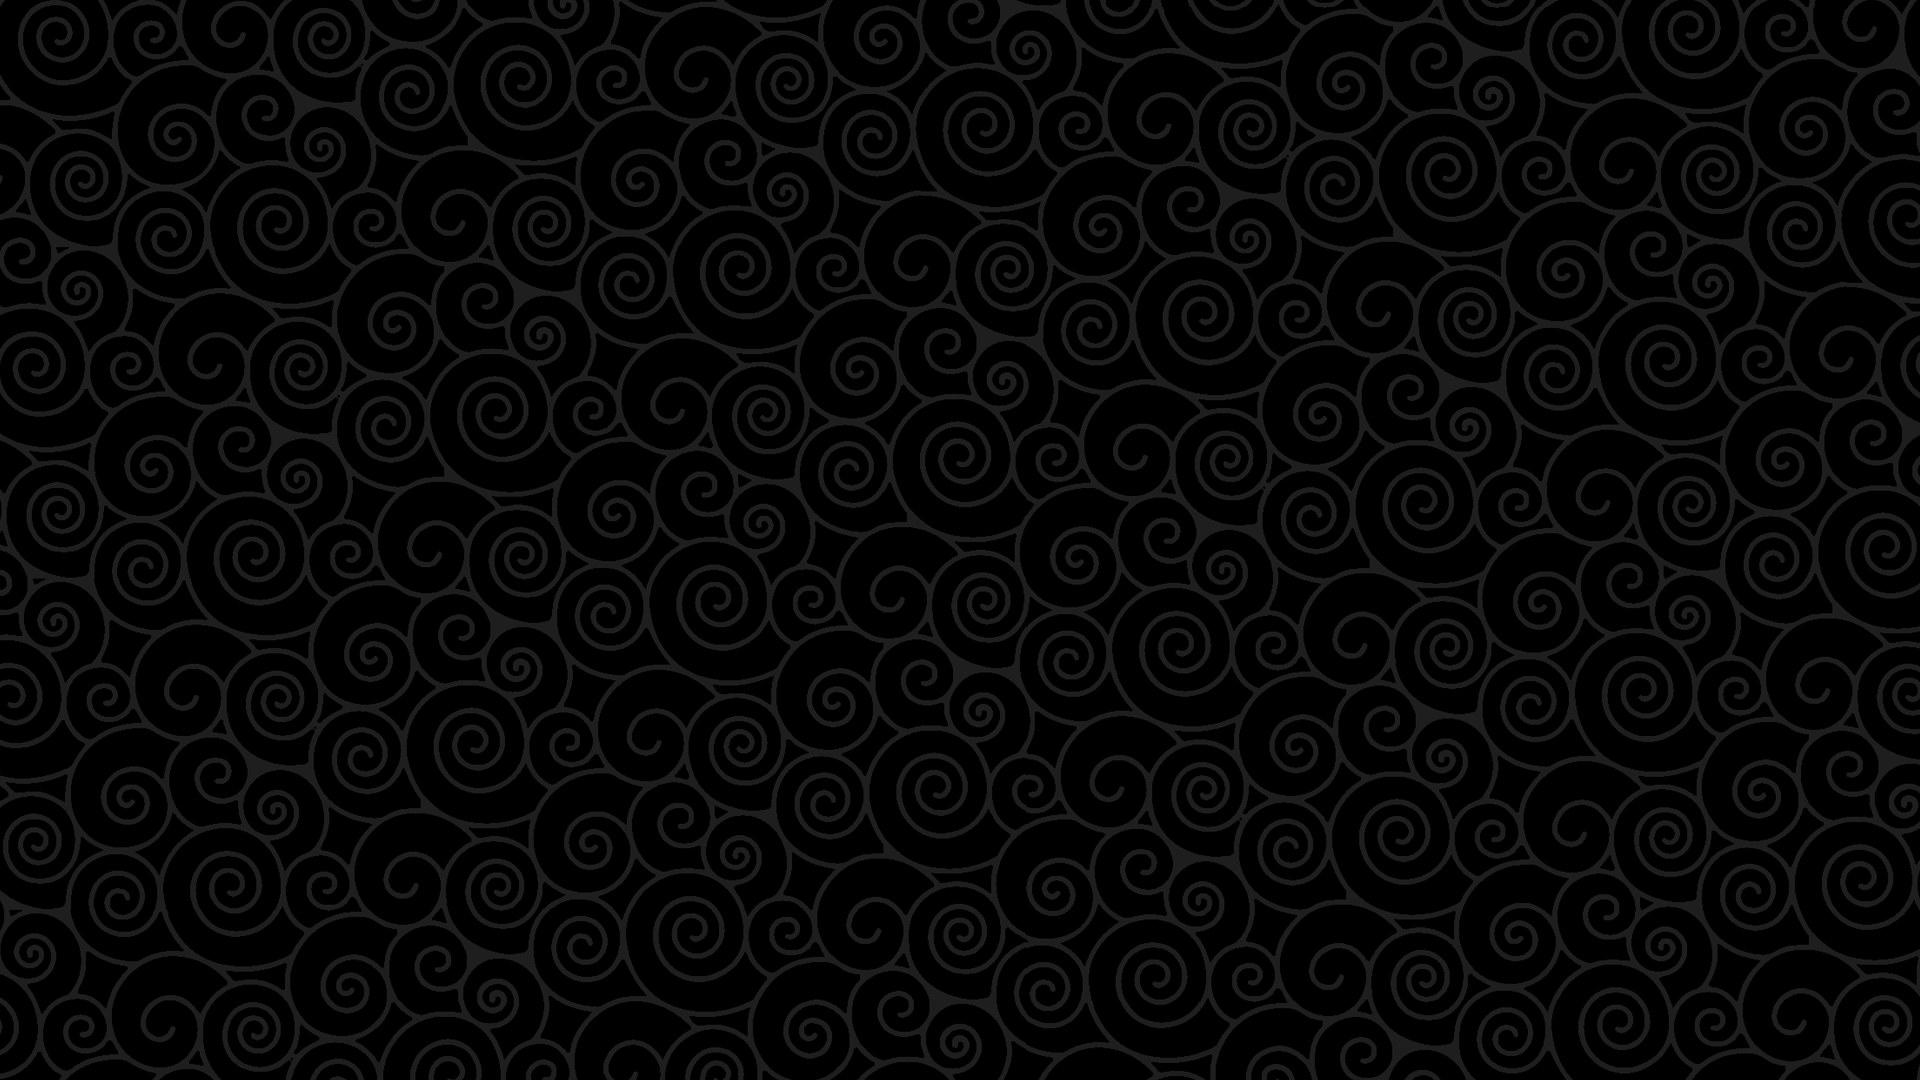 Dark pattern backgrounds